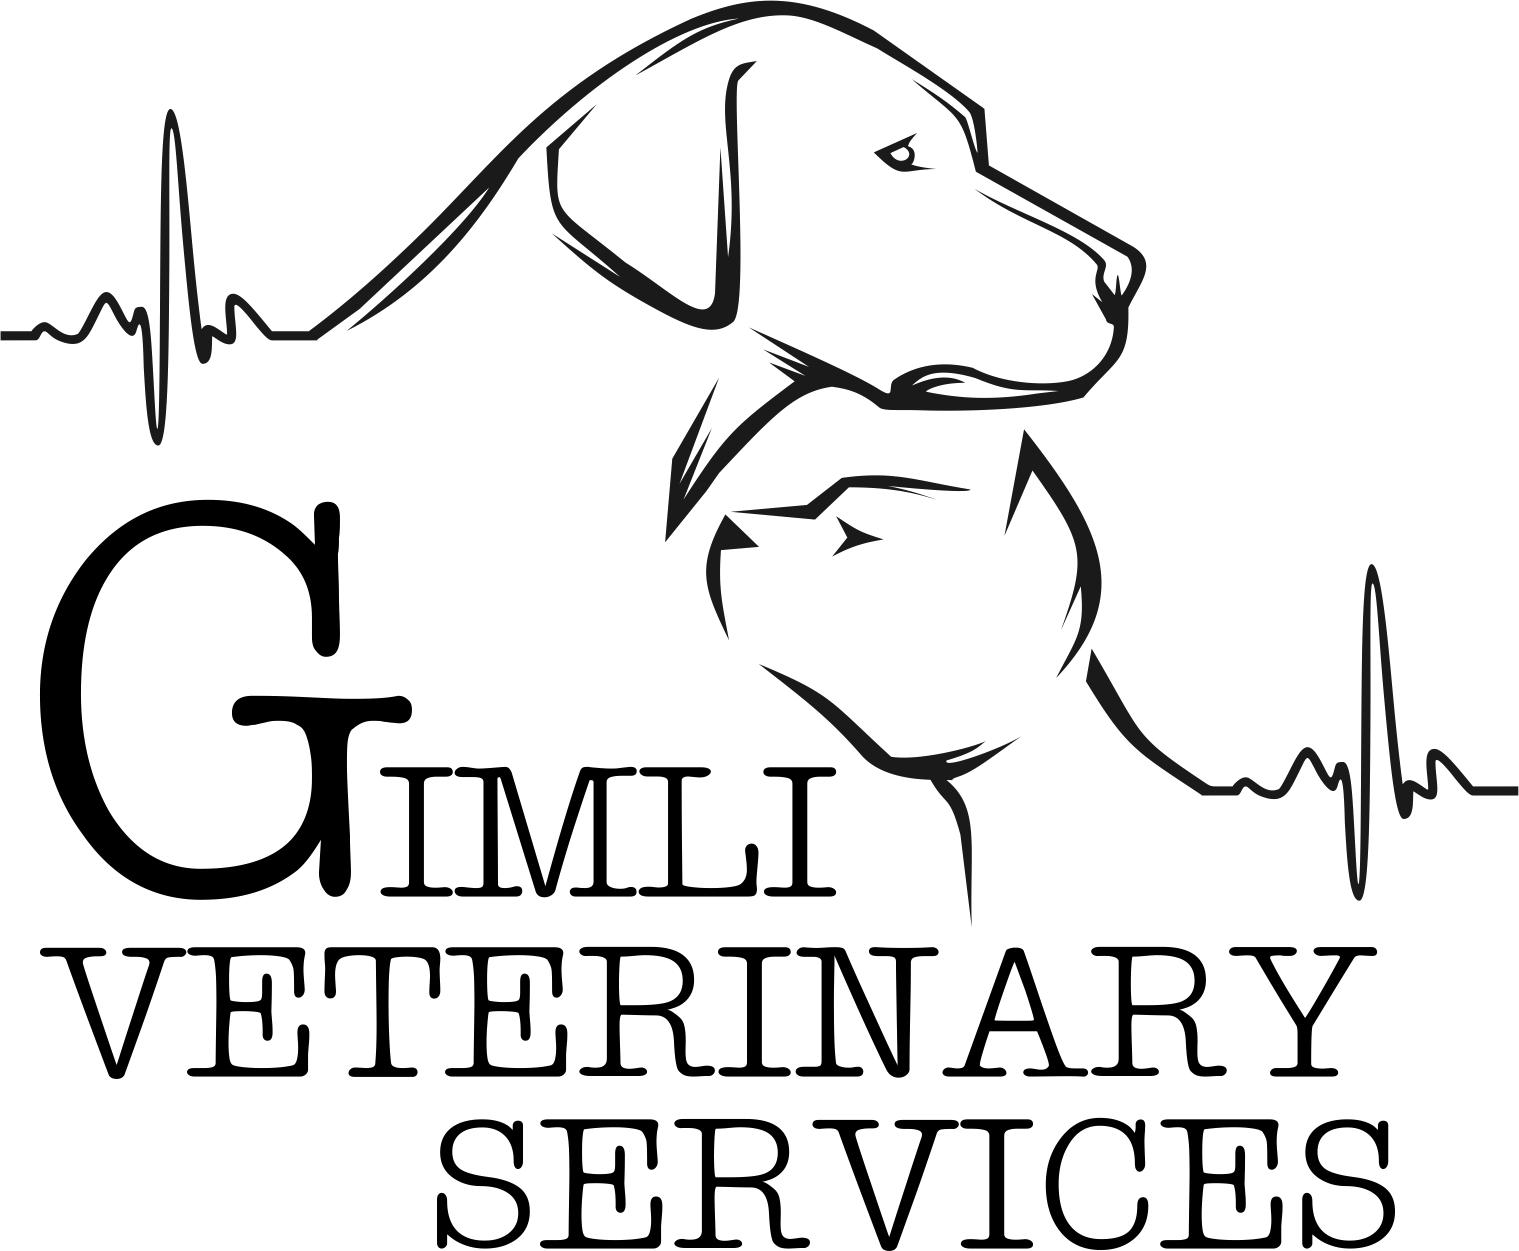 Gimli Veterinary Services